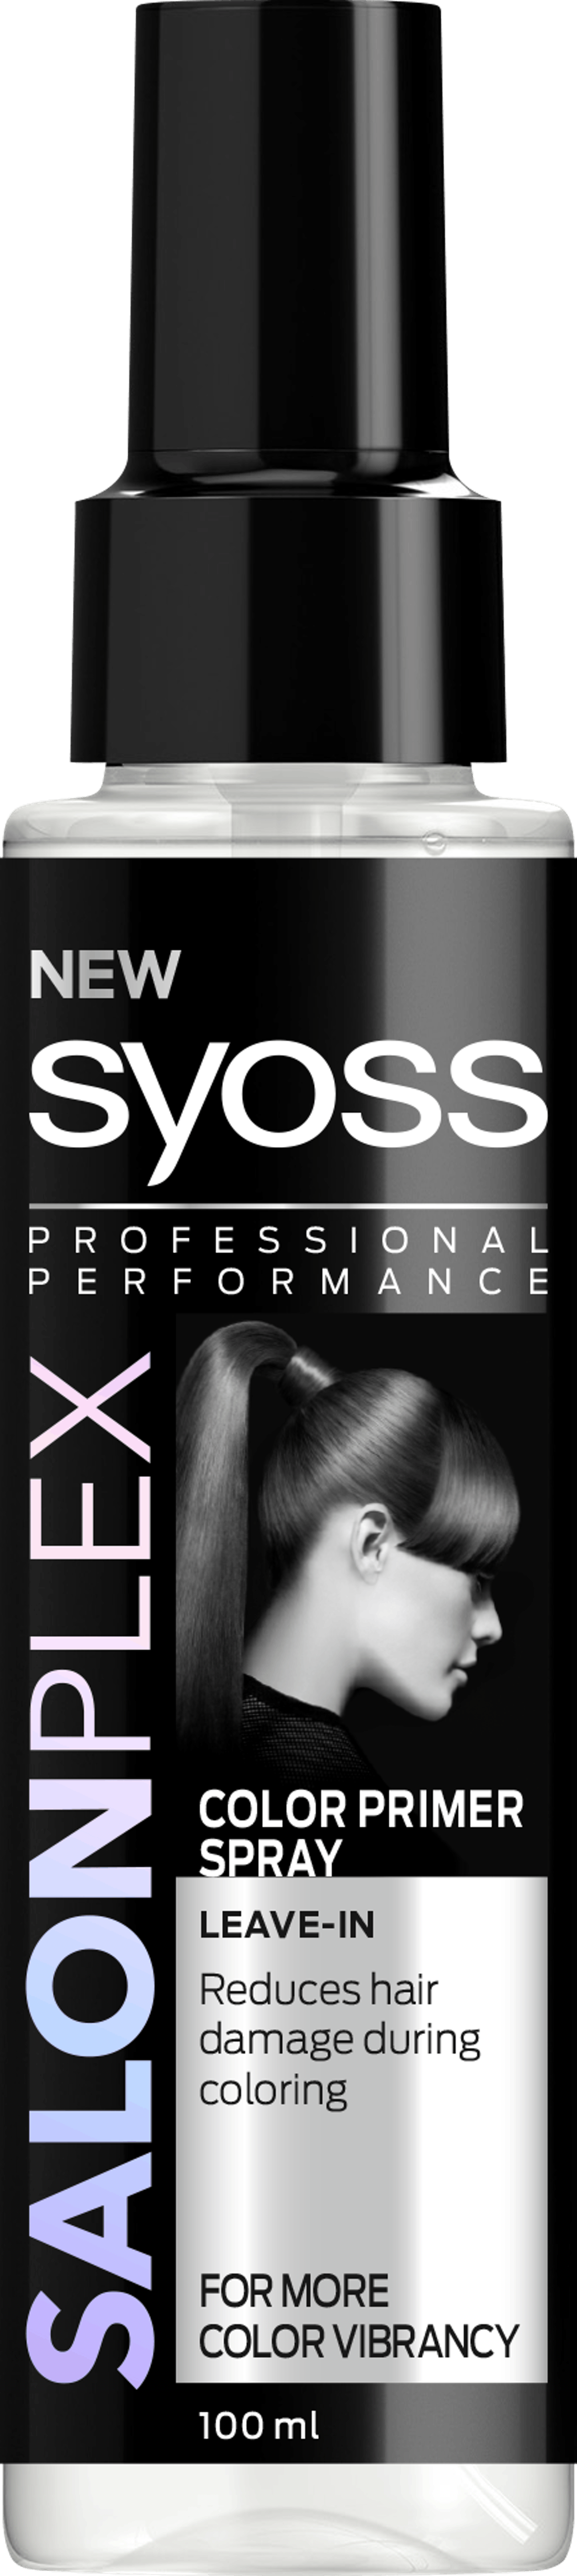 Syoss Salonplex Color Primer Spray